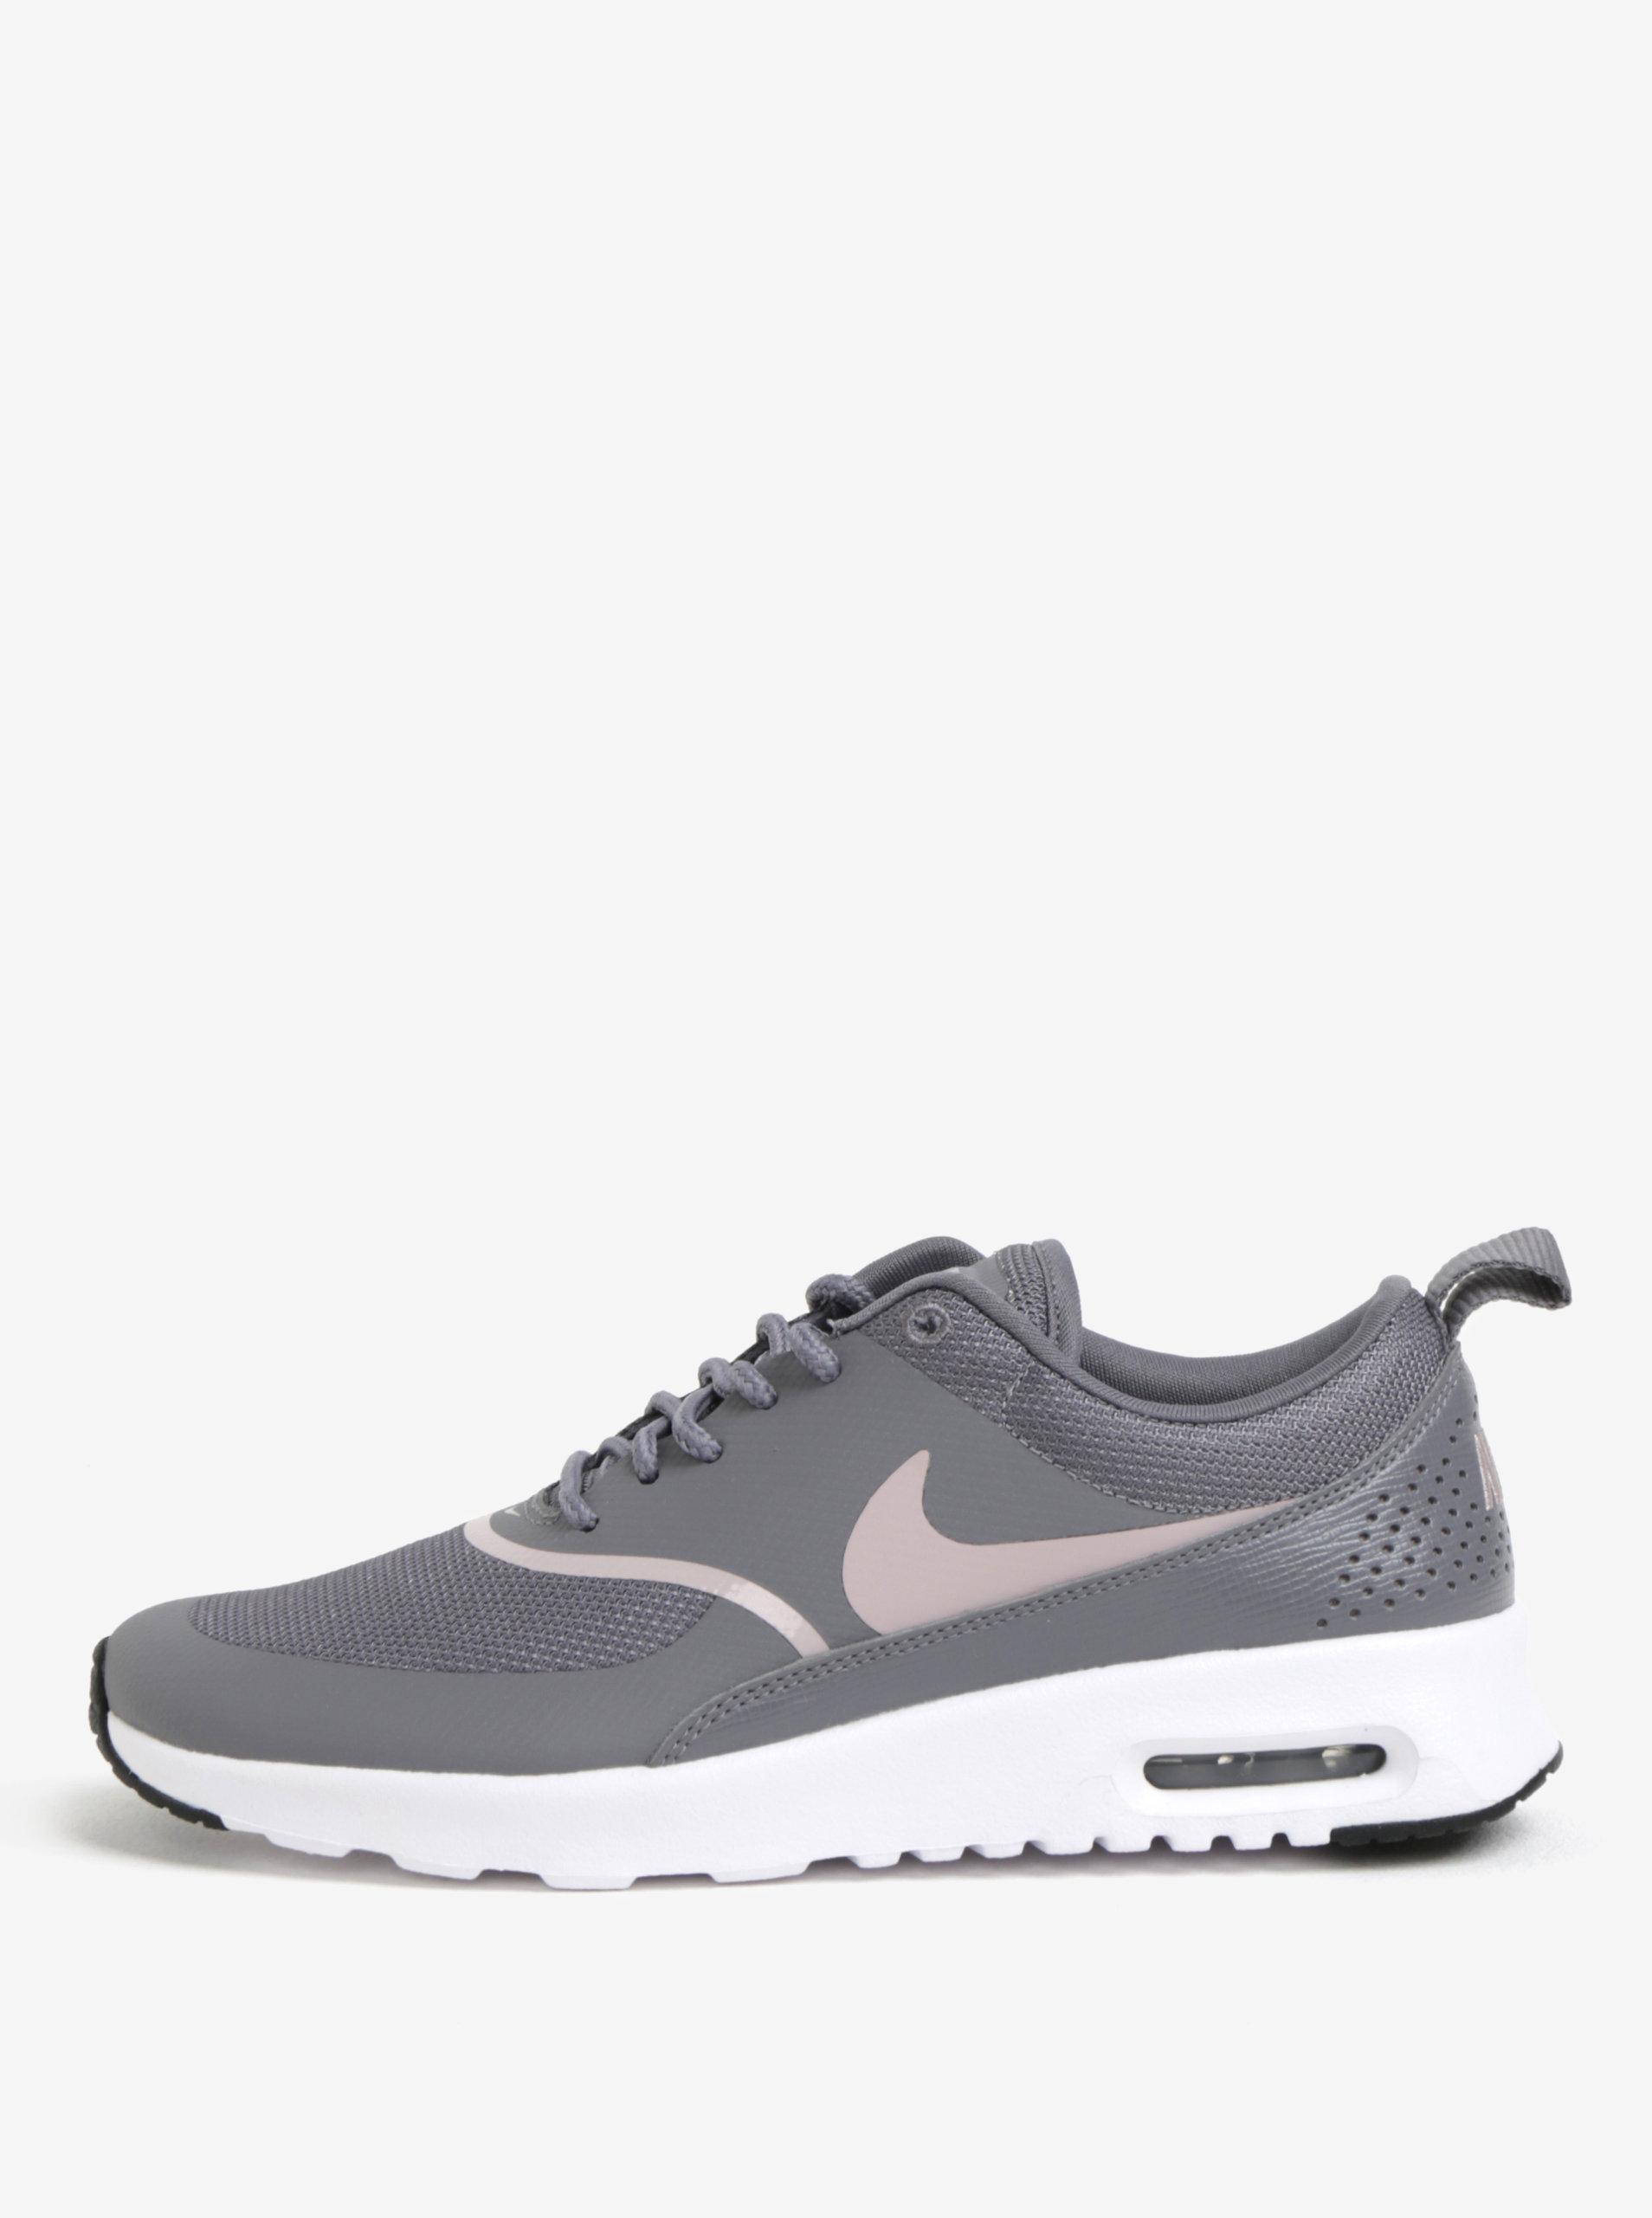 Šedé dámské tenisky Nike Air Max Thea ... bc7402c73e6